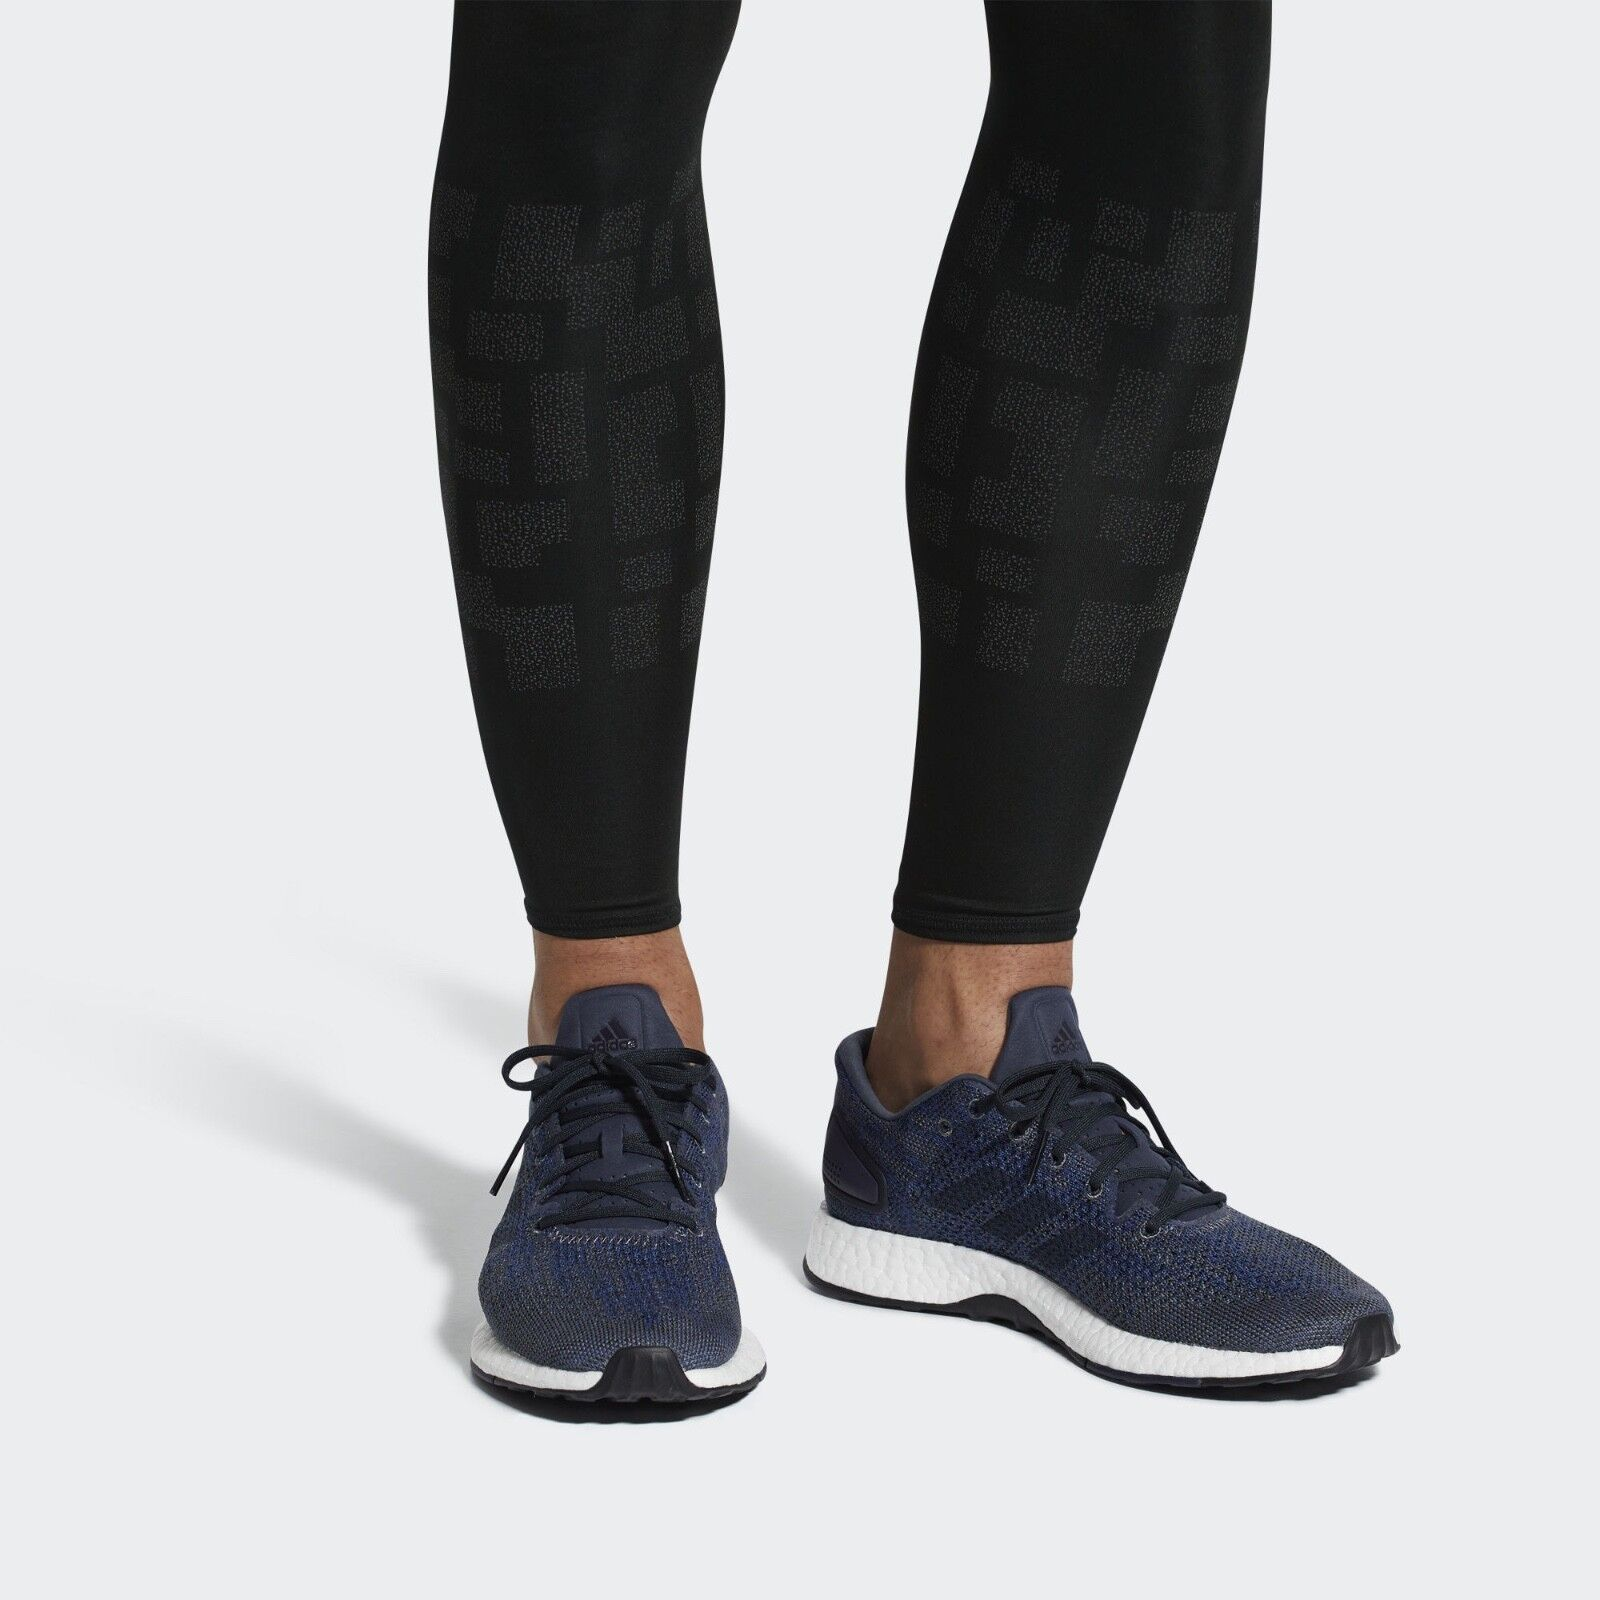 Adidas Pureboost DPR scarpe Men's LEGEND INK   LEGEND INK Dimensione  promozioni eccitanti